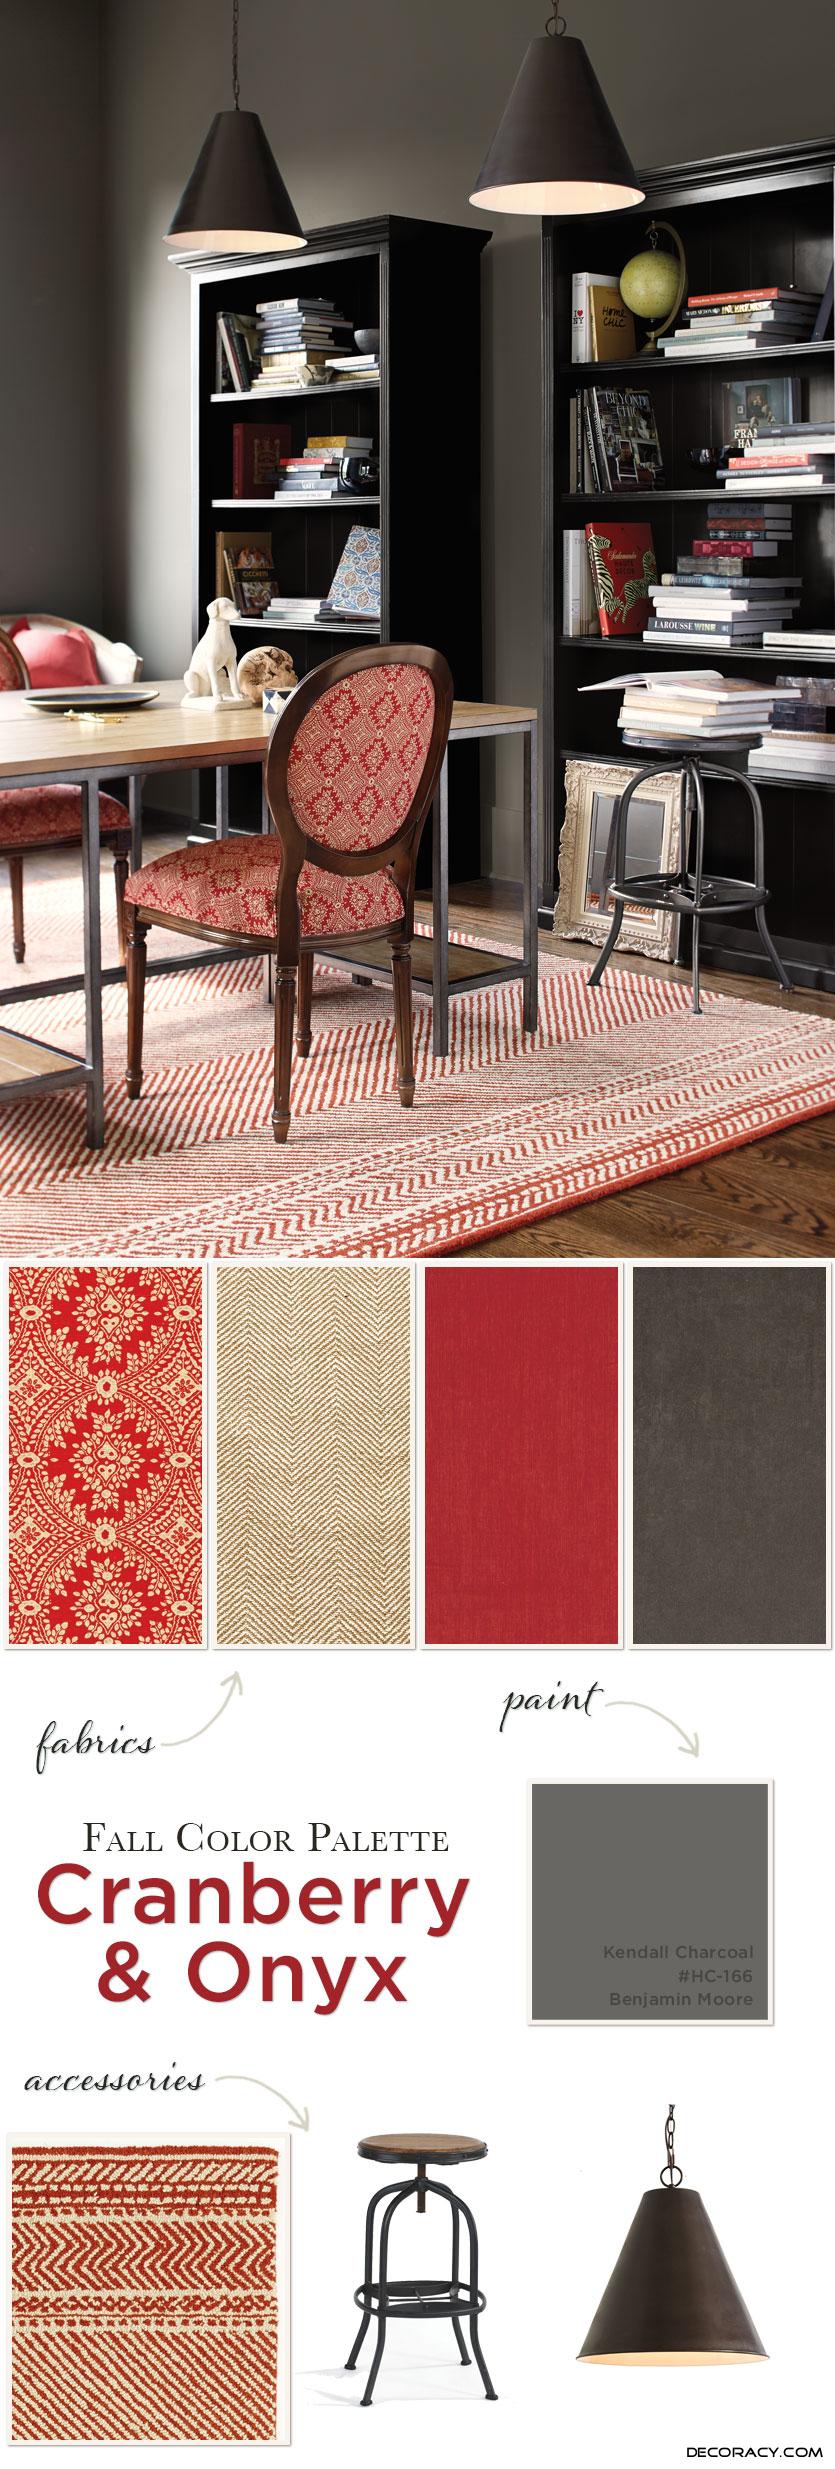 Fall Color Palette: Cranberry & Onyx - http://www.decoracy.com ...